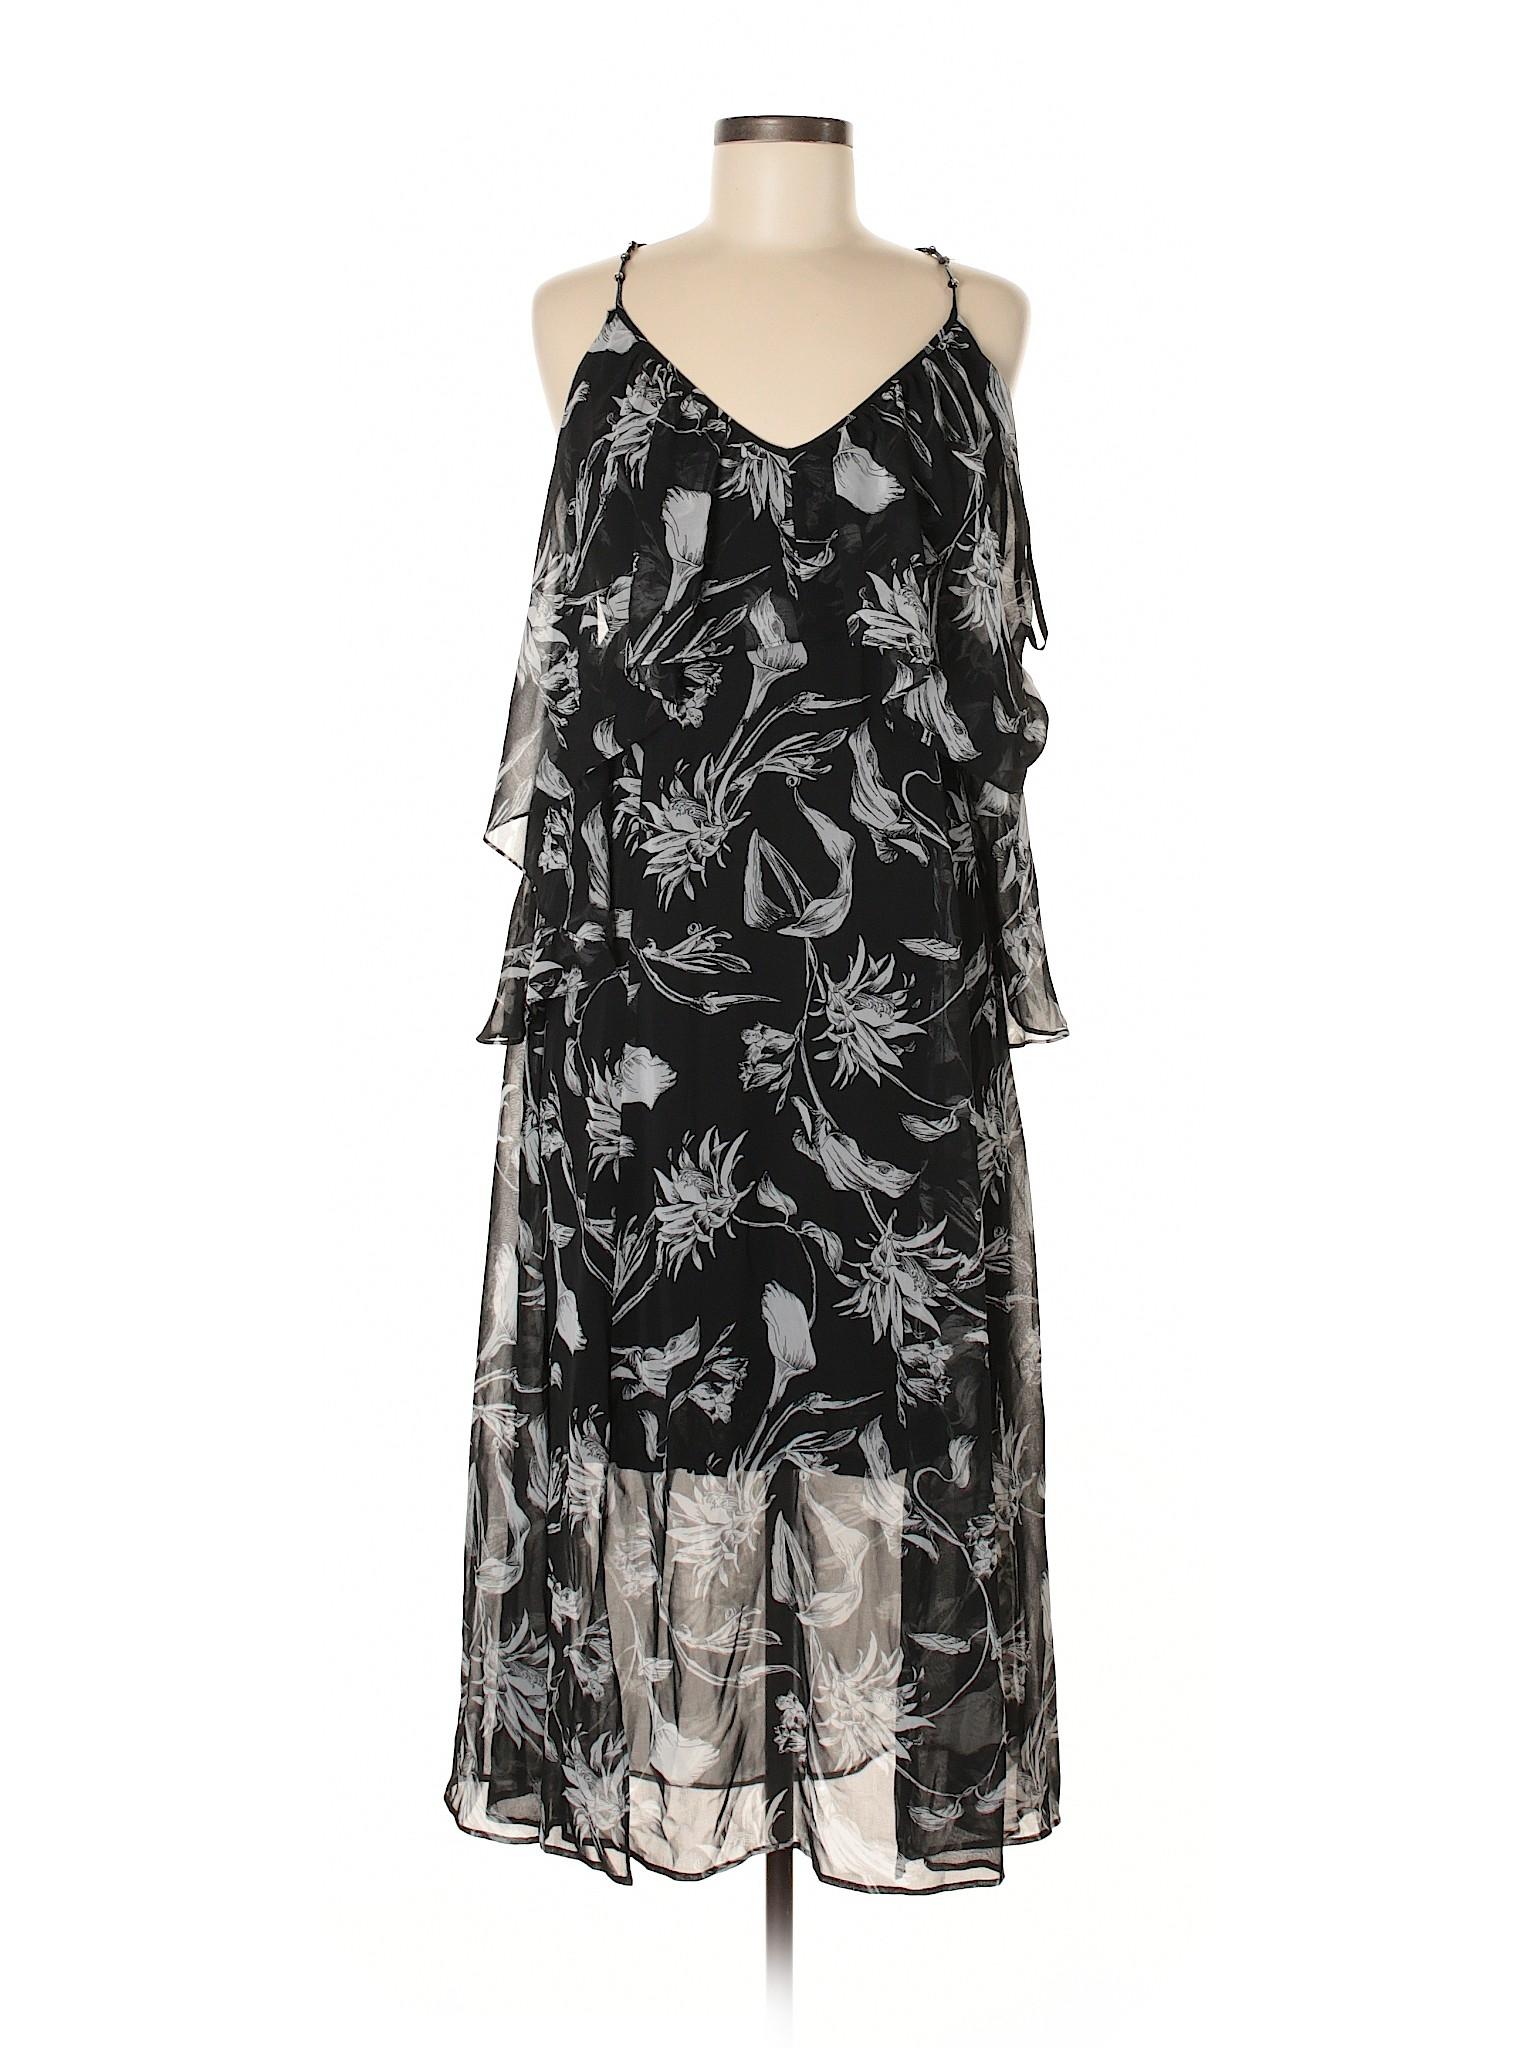 Dress Casual House White Selling Market Black wxIXn7Aq